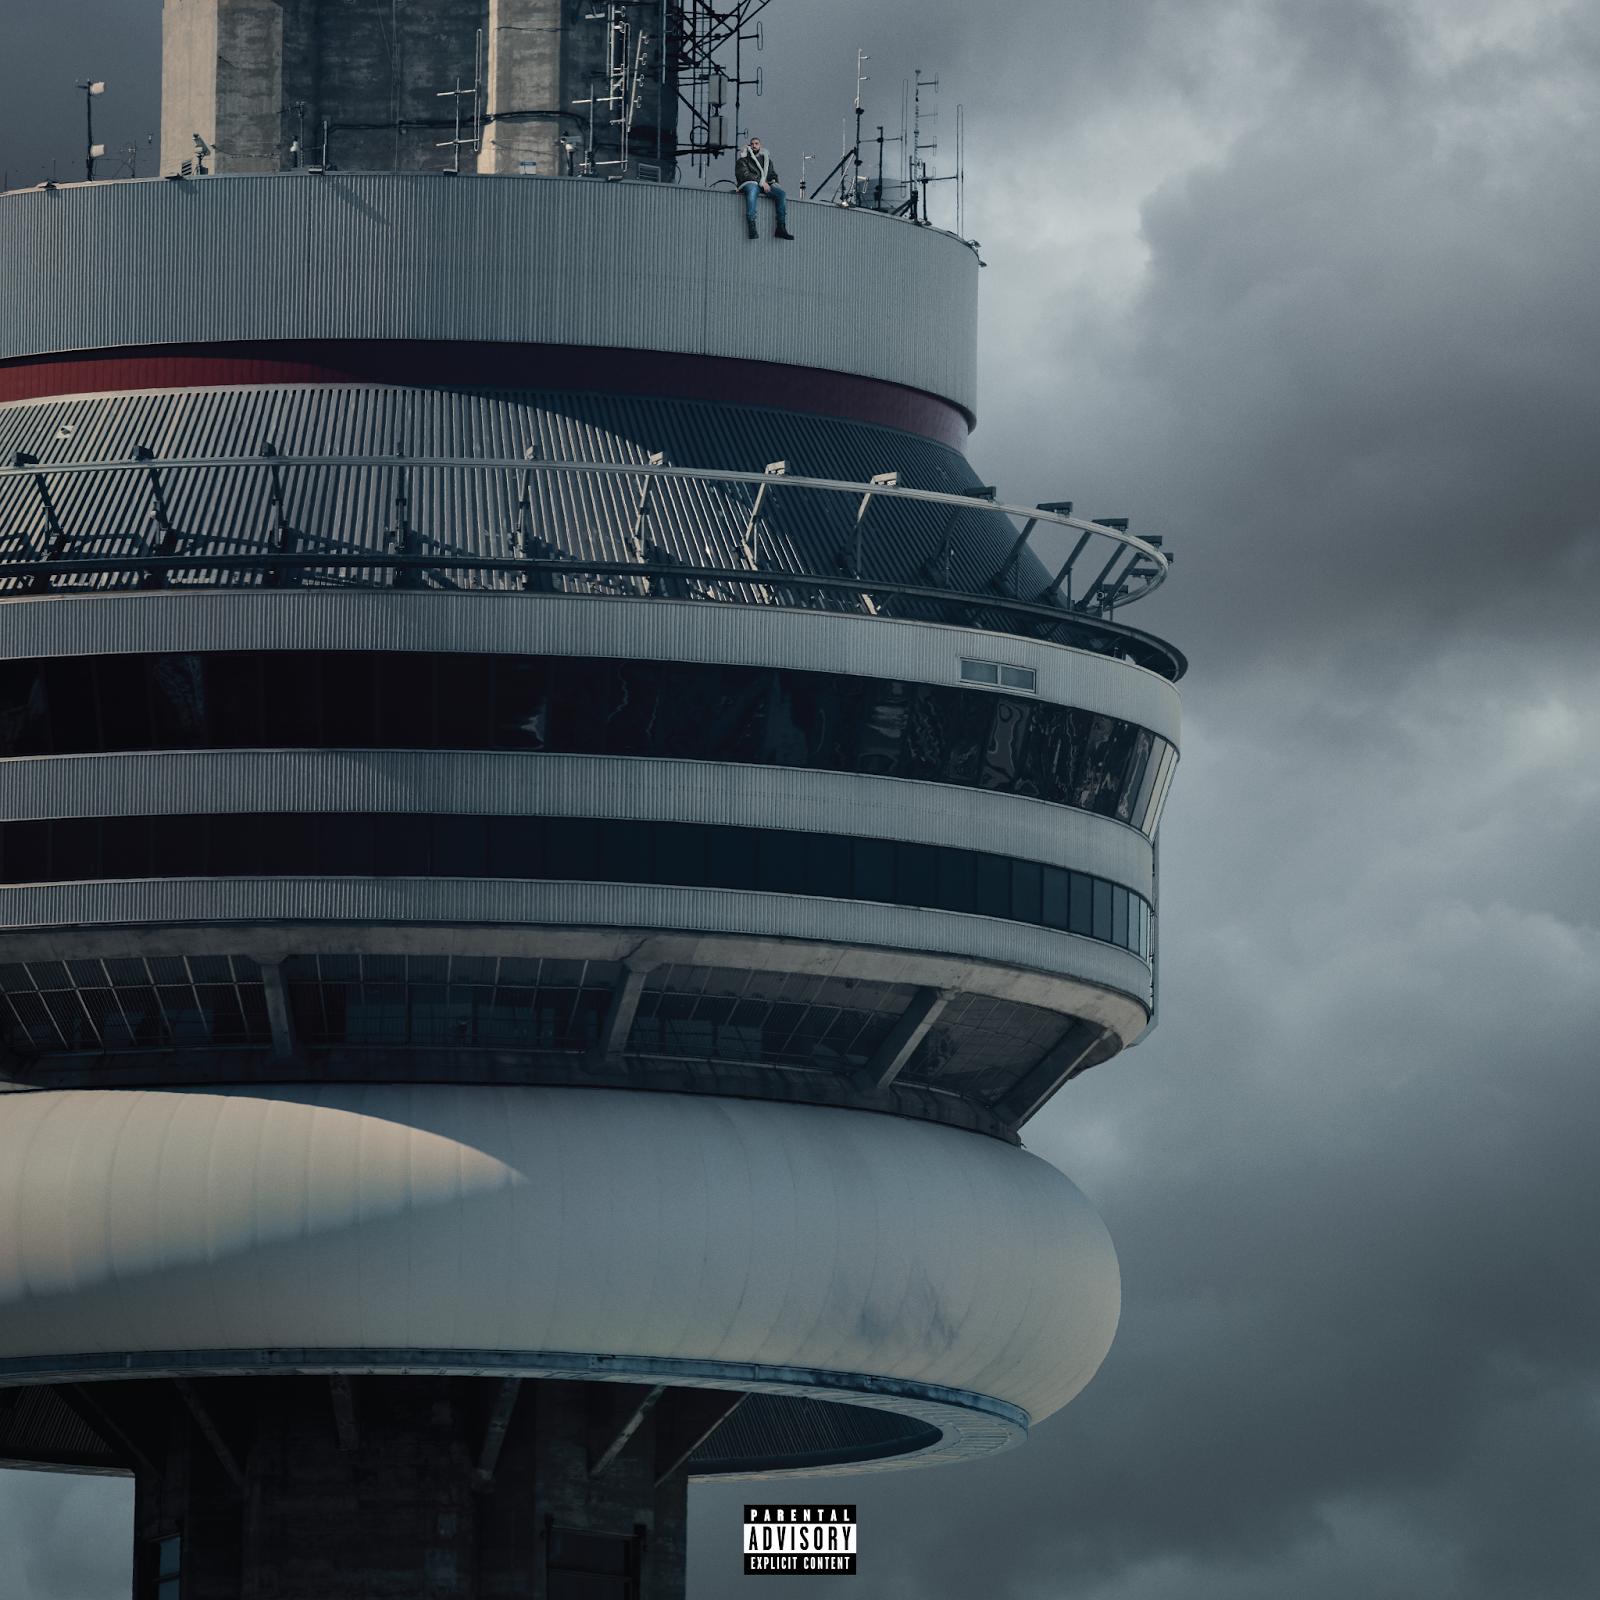 Drake Views Album Cover - Album Stream Drake Views -